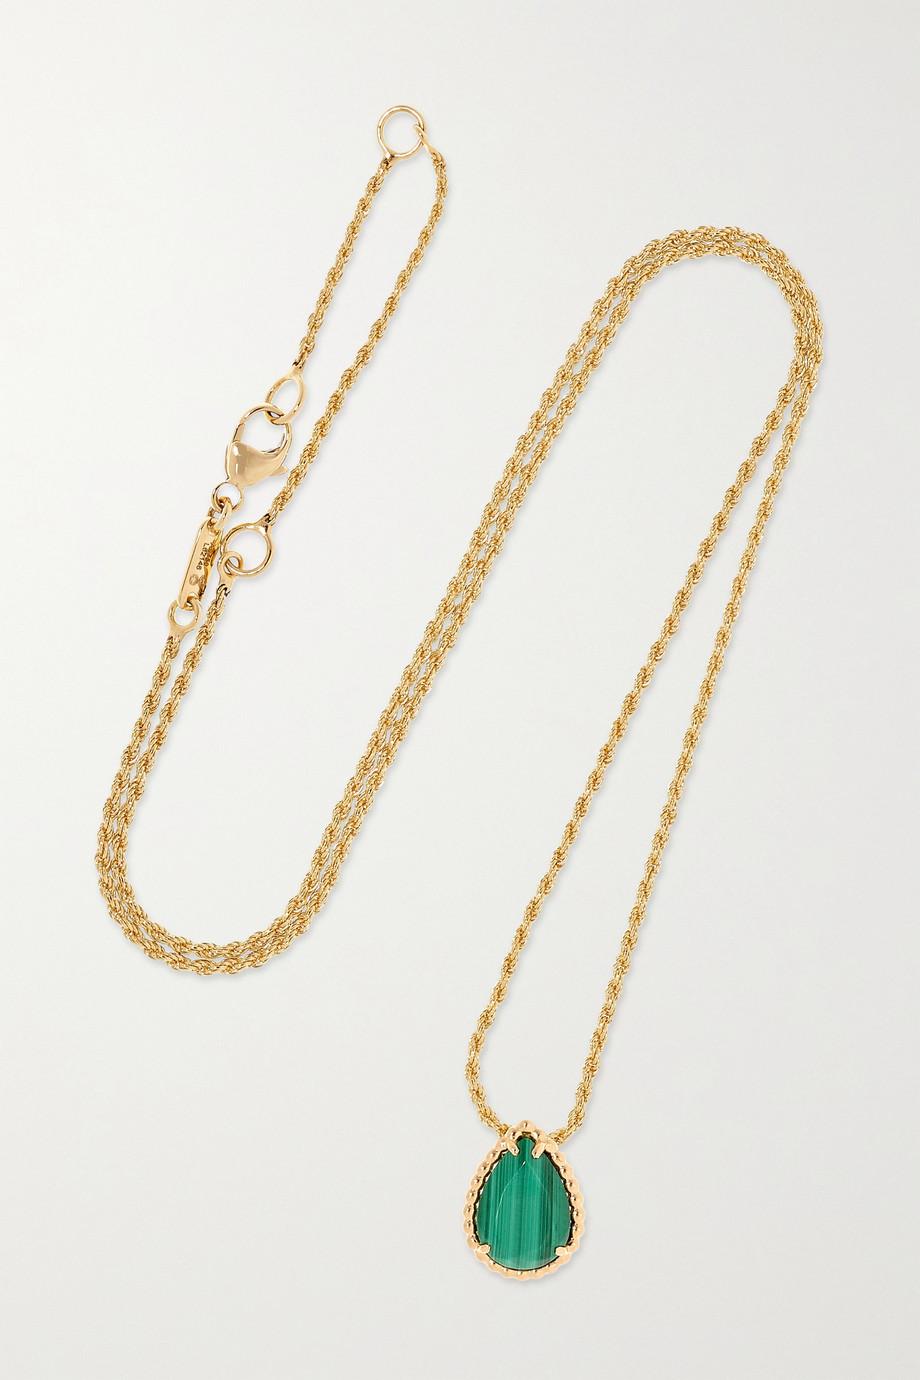 Boucheron Serpent Bohème Kette aus 18 Karat Gold mit Malachit